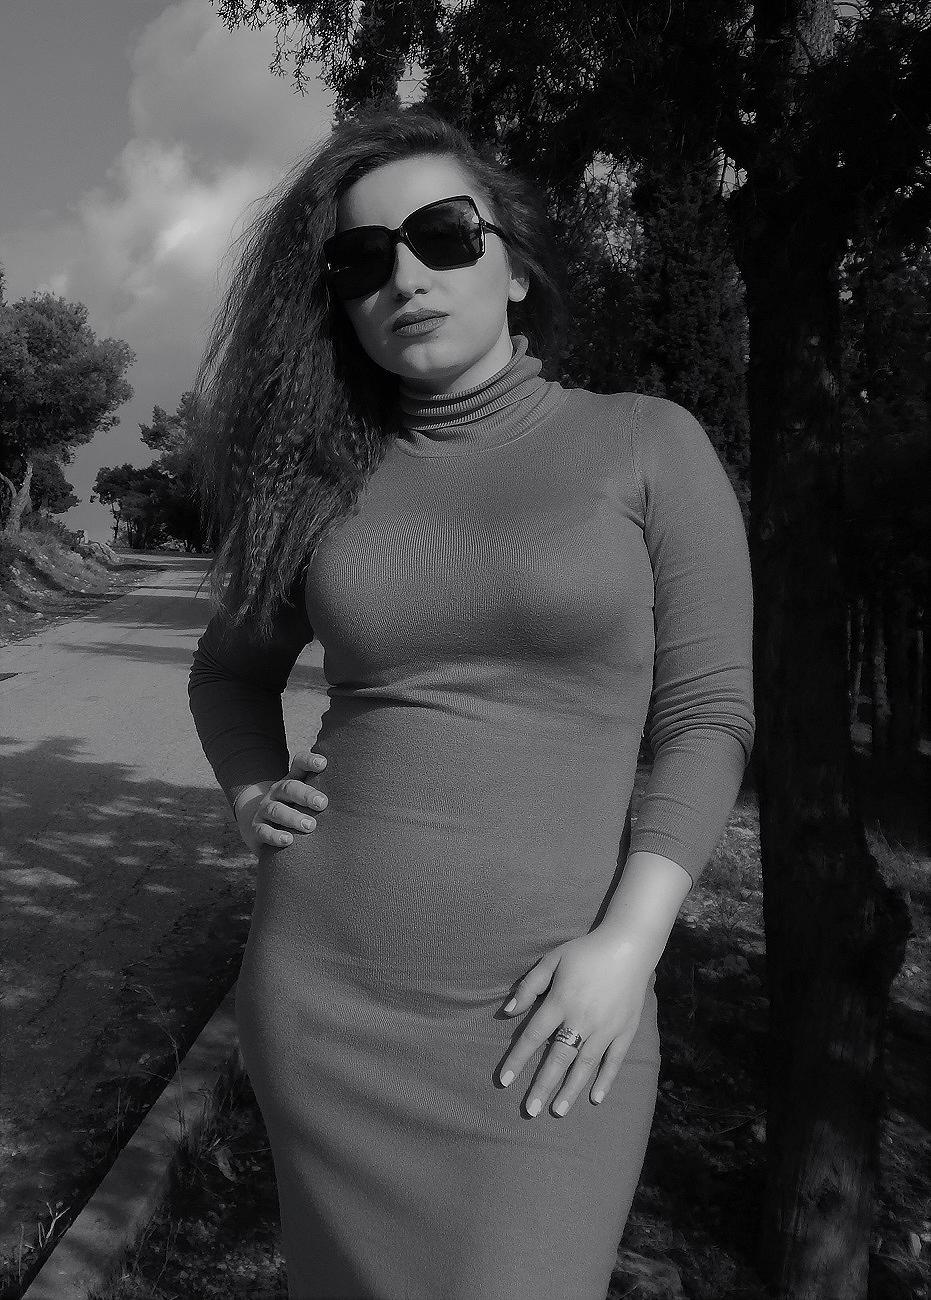 lorena_stroka_gazetare_wikipedia_biografia_albstroka_blog_forum_2017